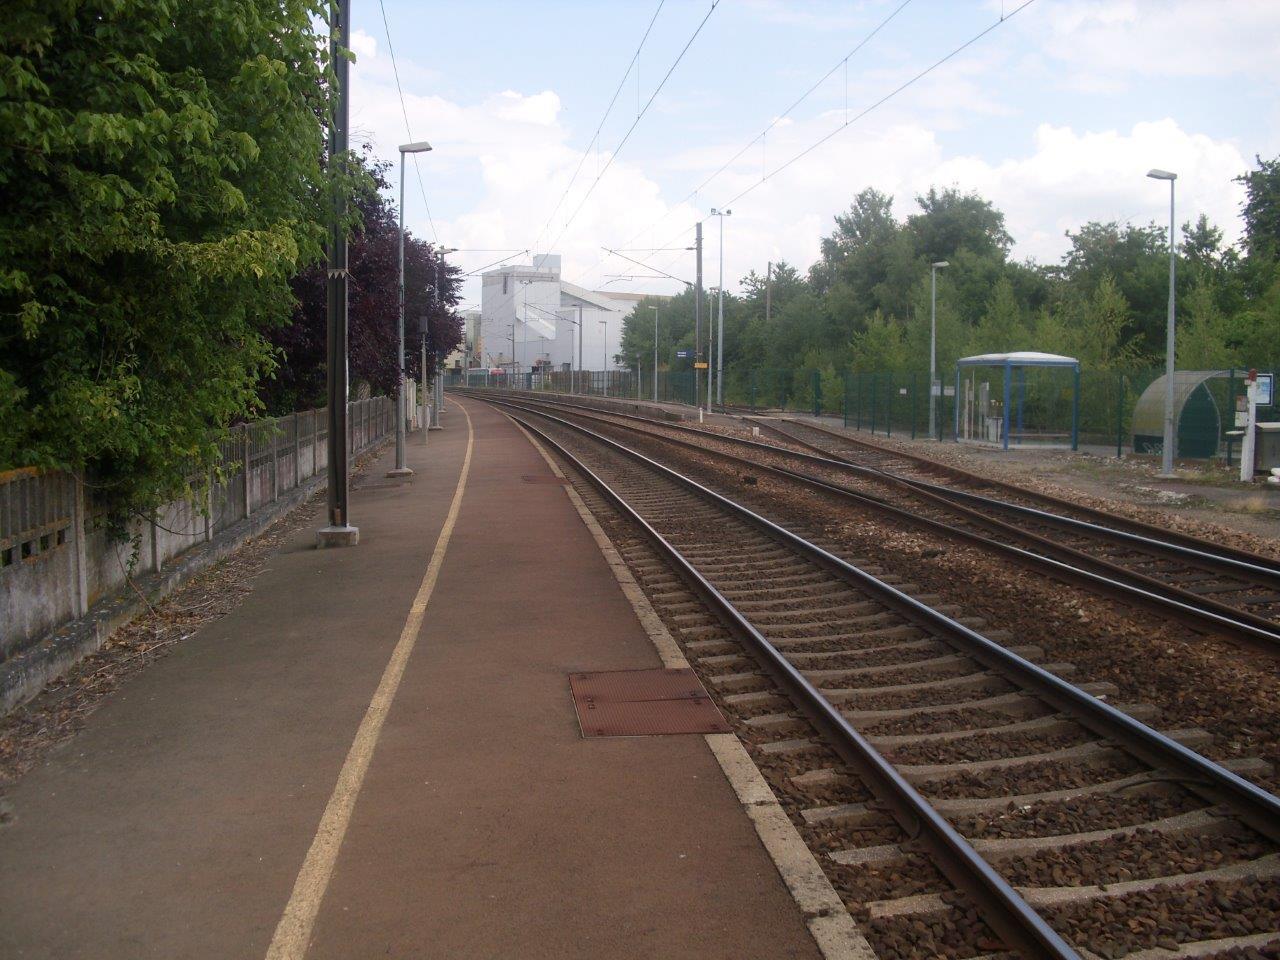 gare-des-lacs-train-station